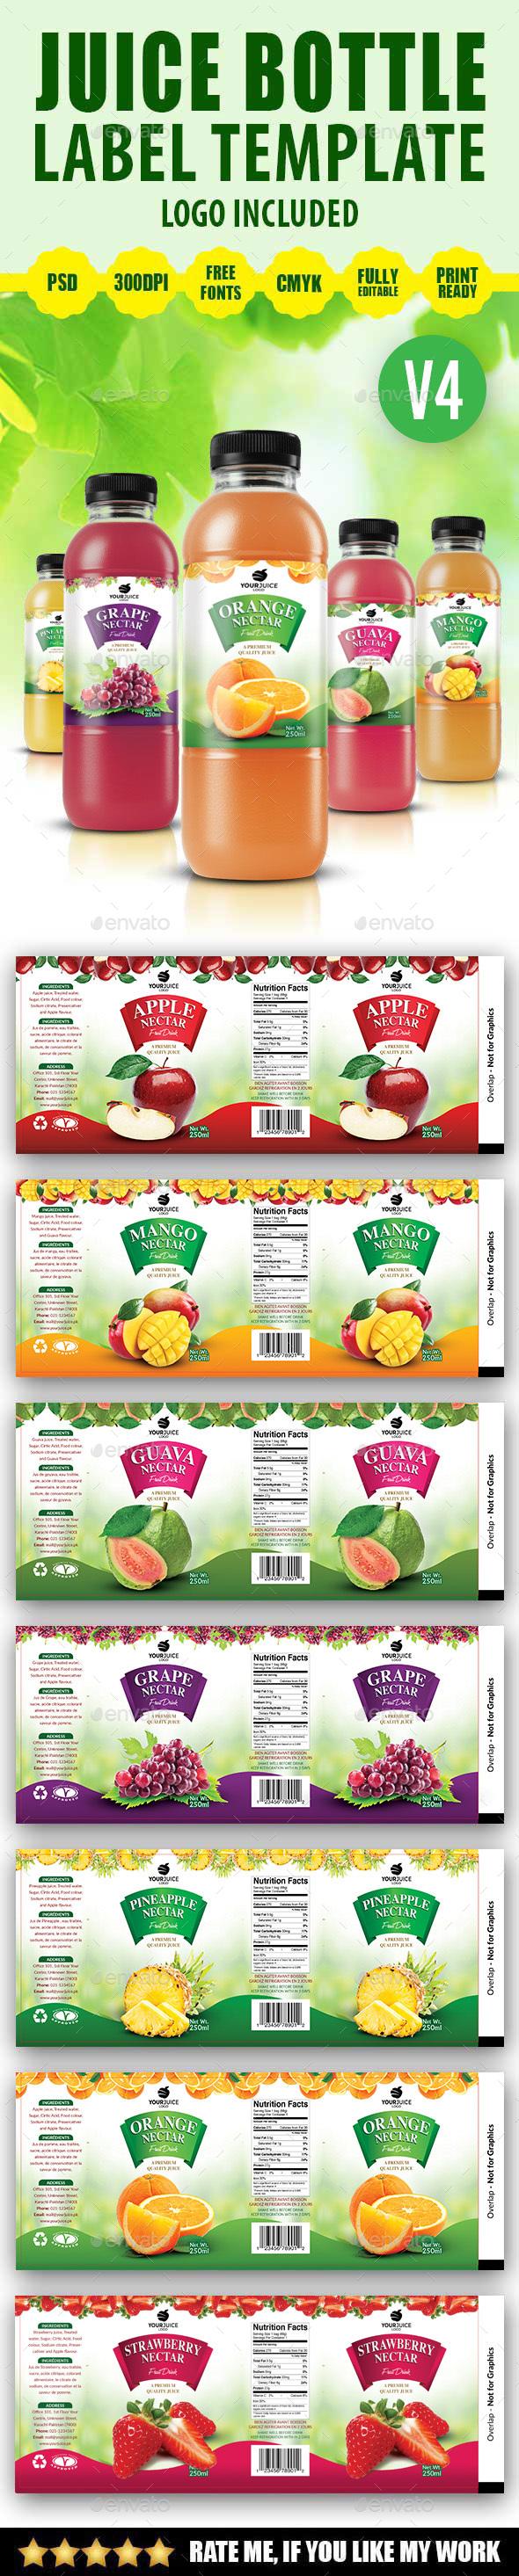 Juice Bottle Label Template V4 - Packaging Print Templates